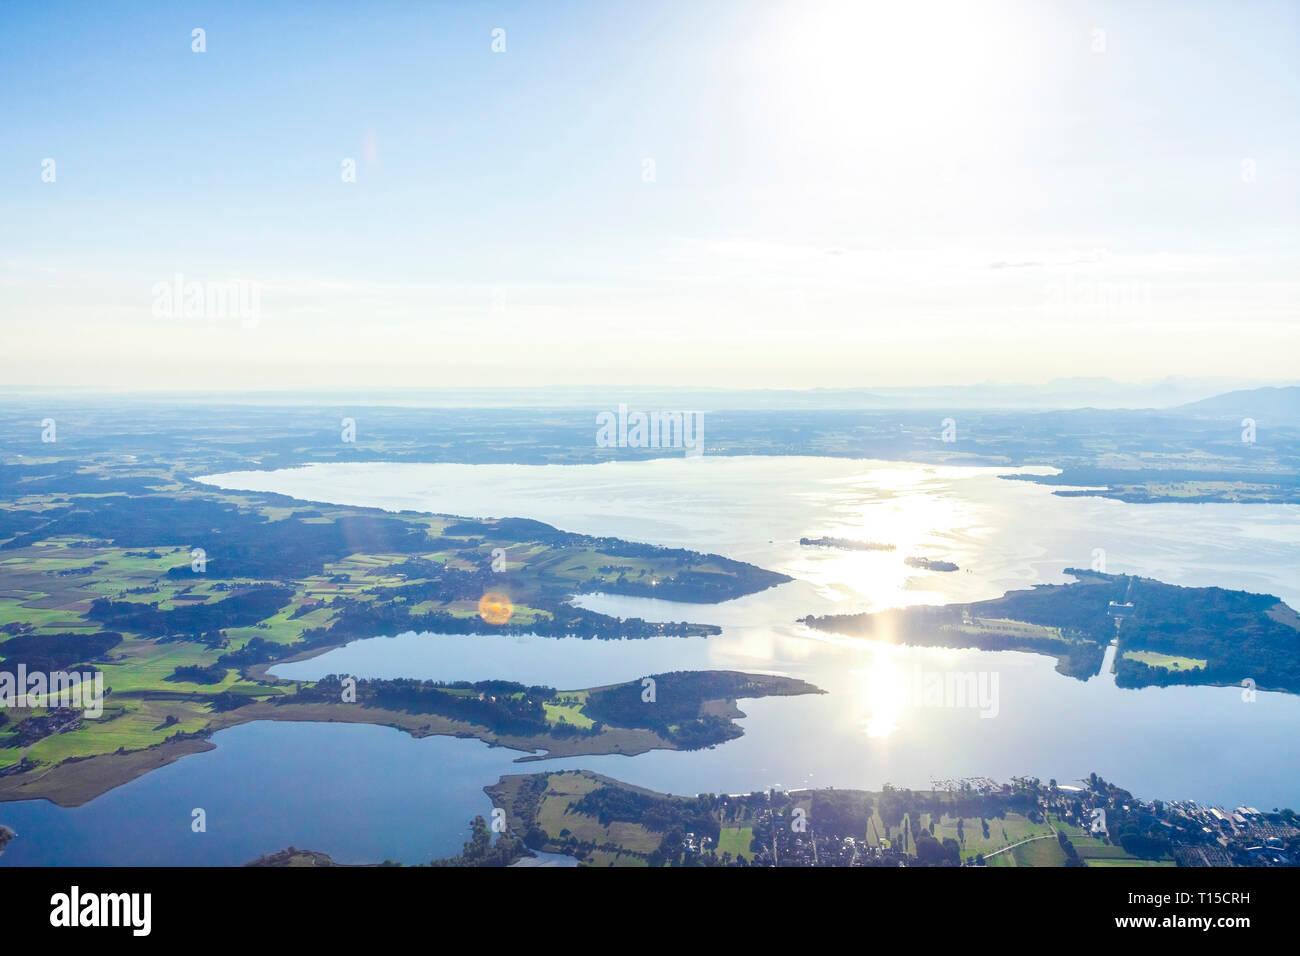 Germany, Bavaria, Chiemgau, Aerial view of Prien and lake Chiemsee Stock Photo